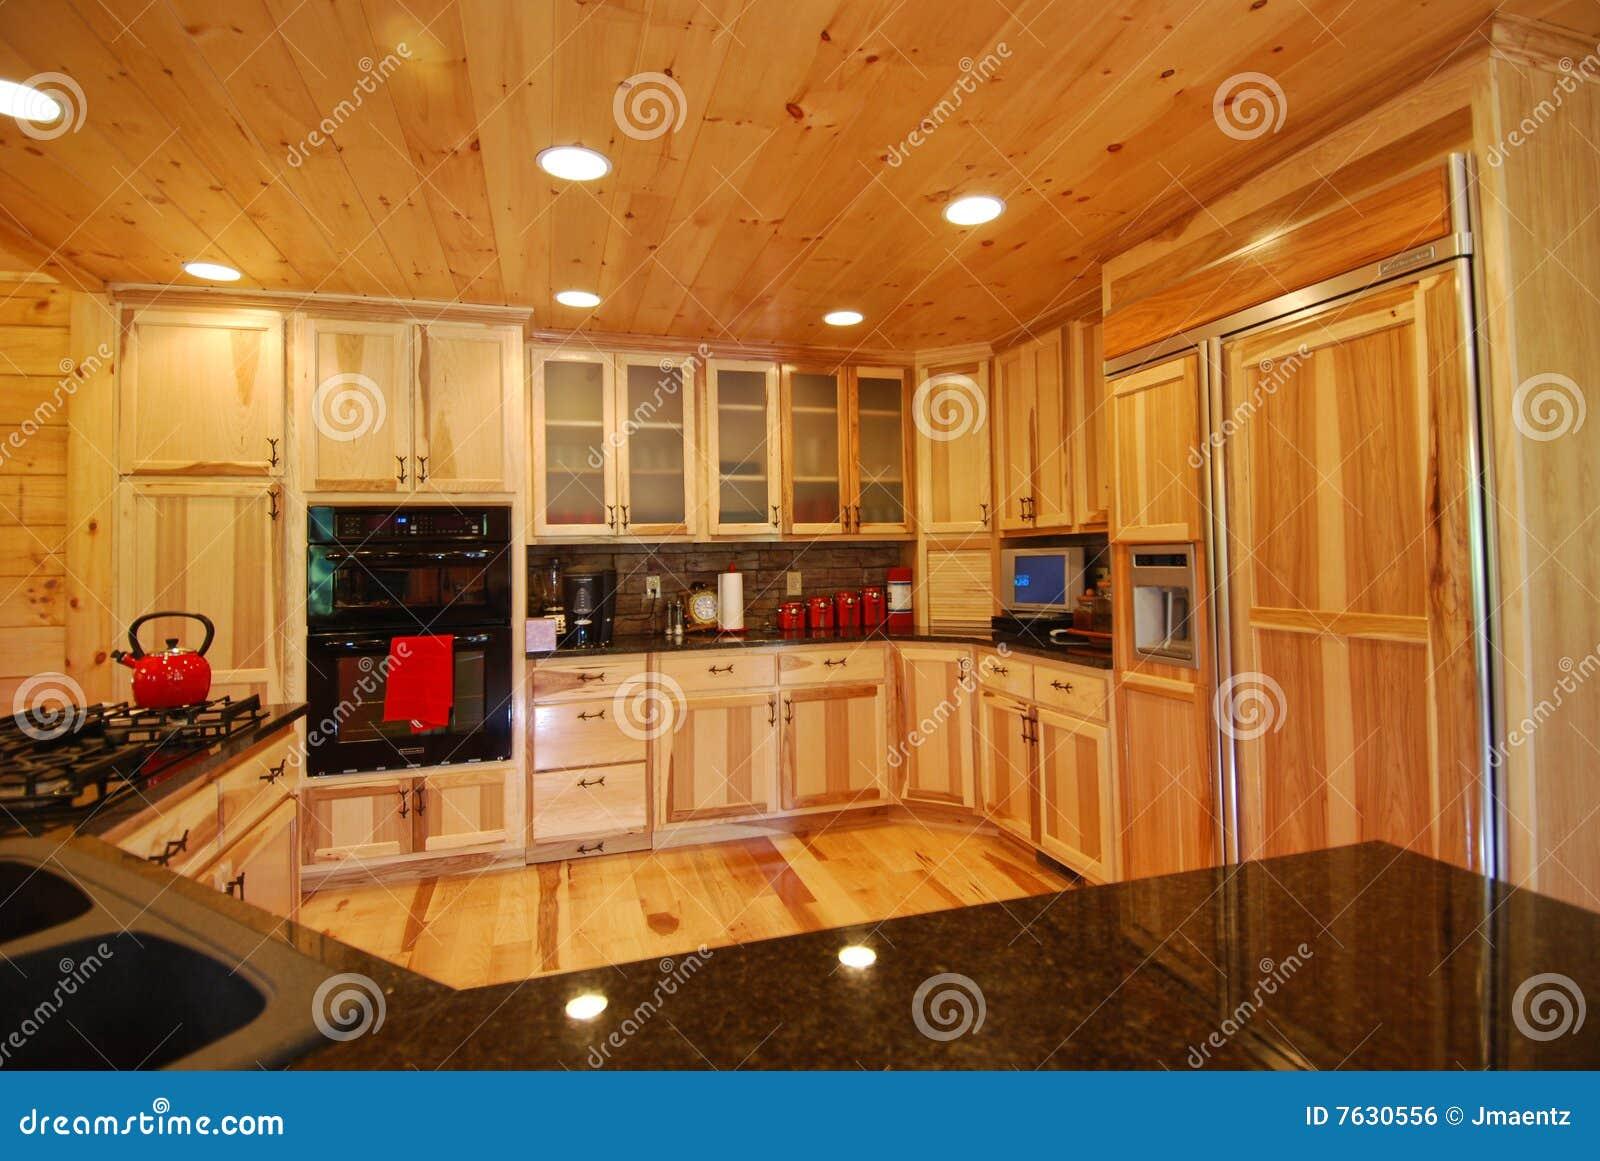 Log House Kitchen Interior Royalty Free Stock Image